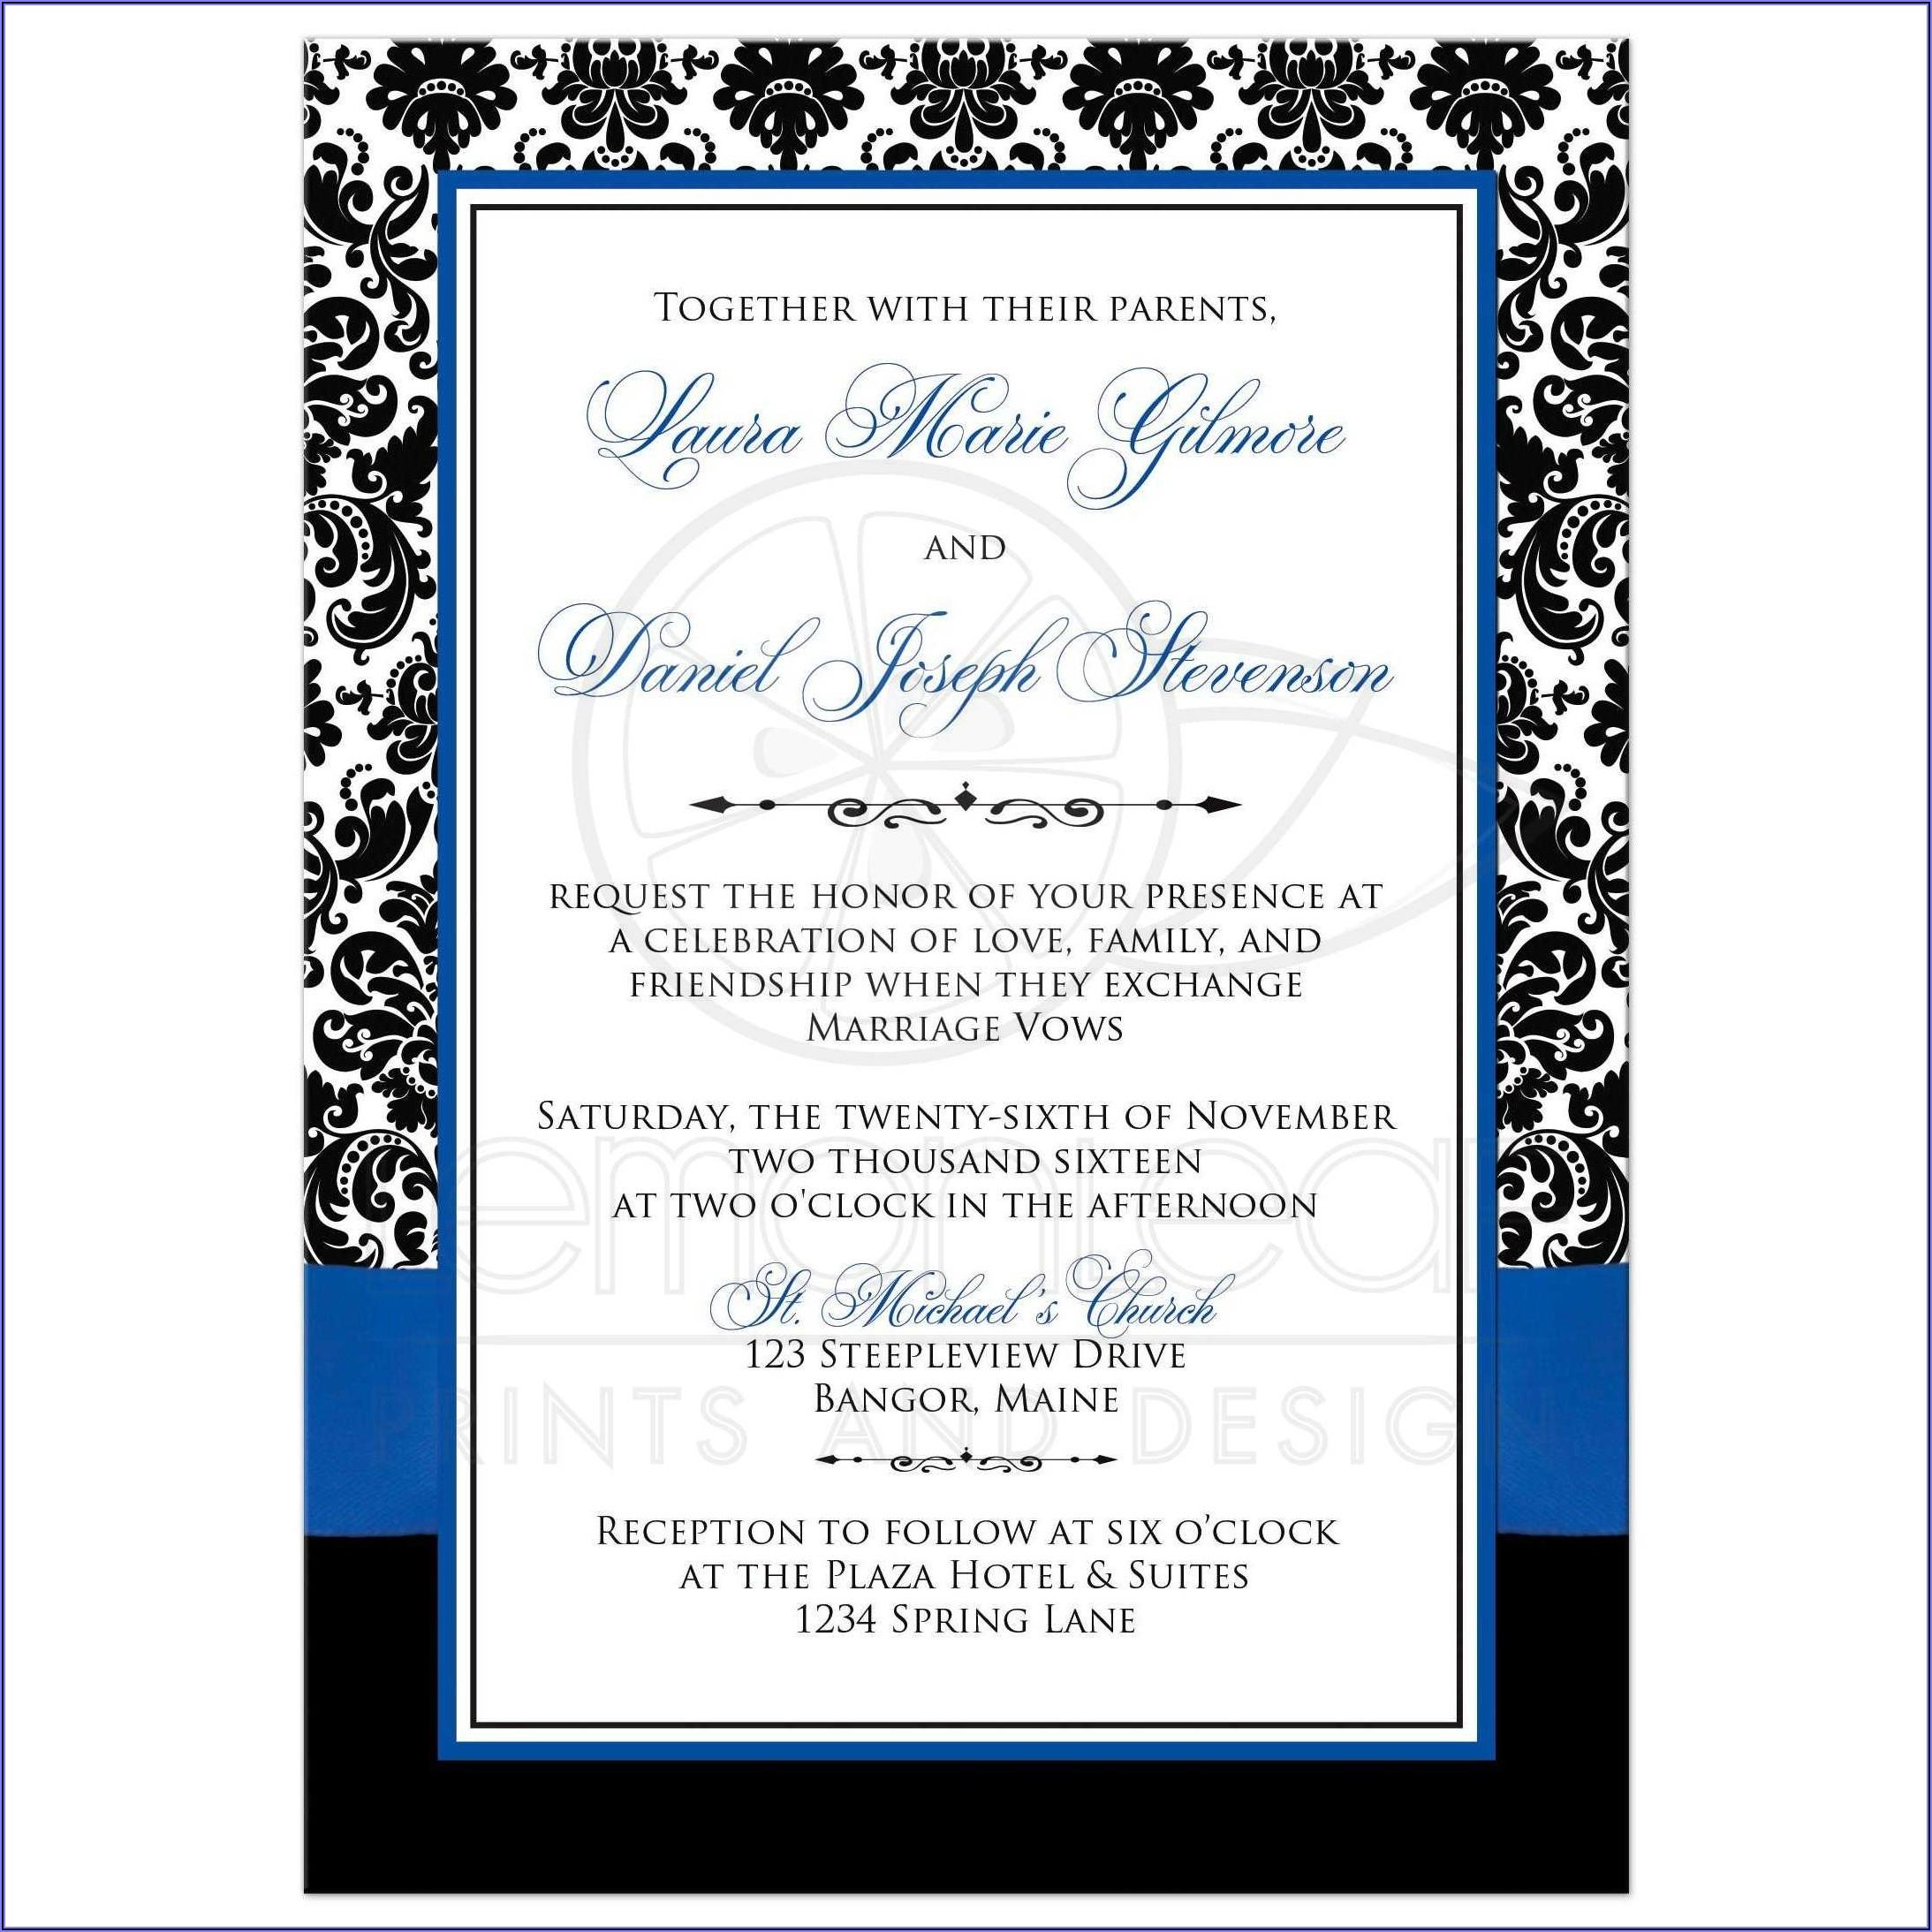 Royal Blue Wedding Invitation Sample